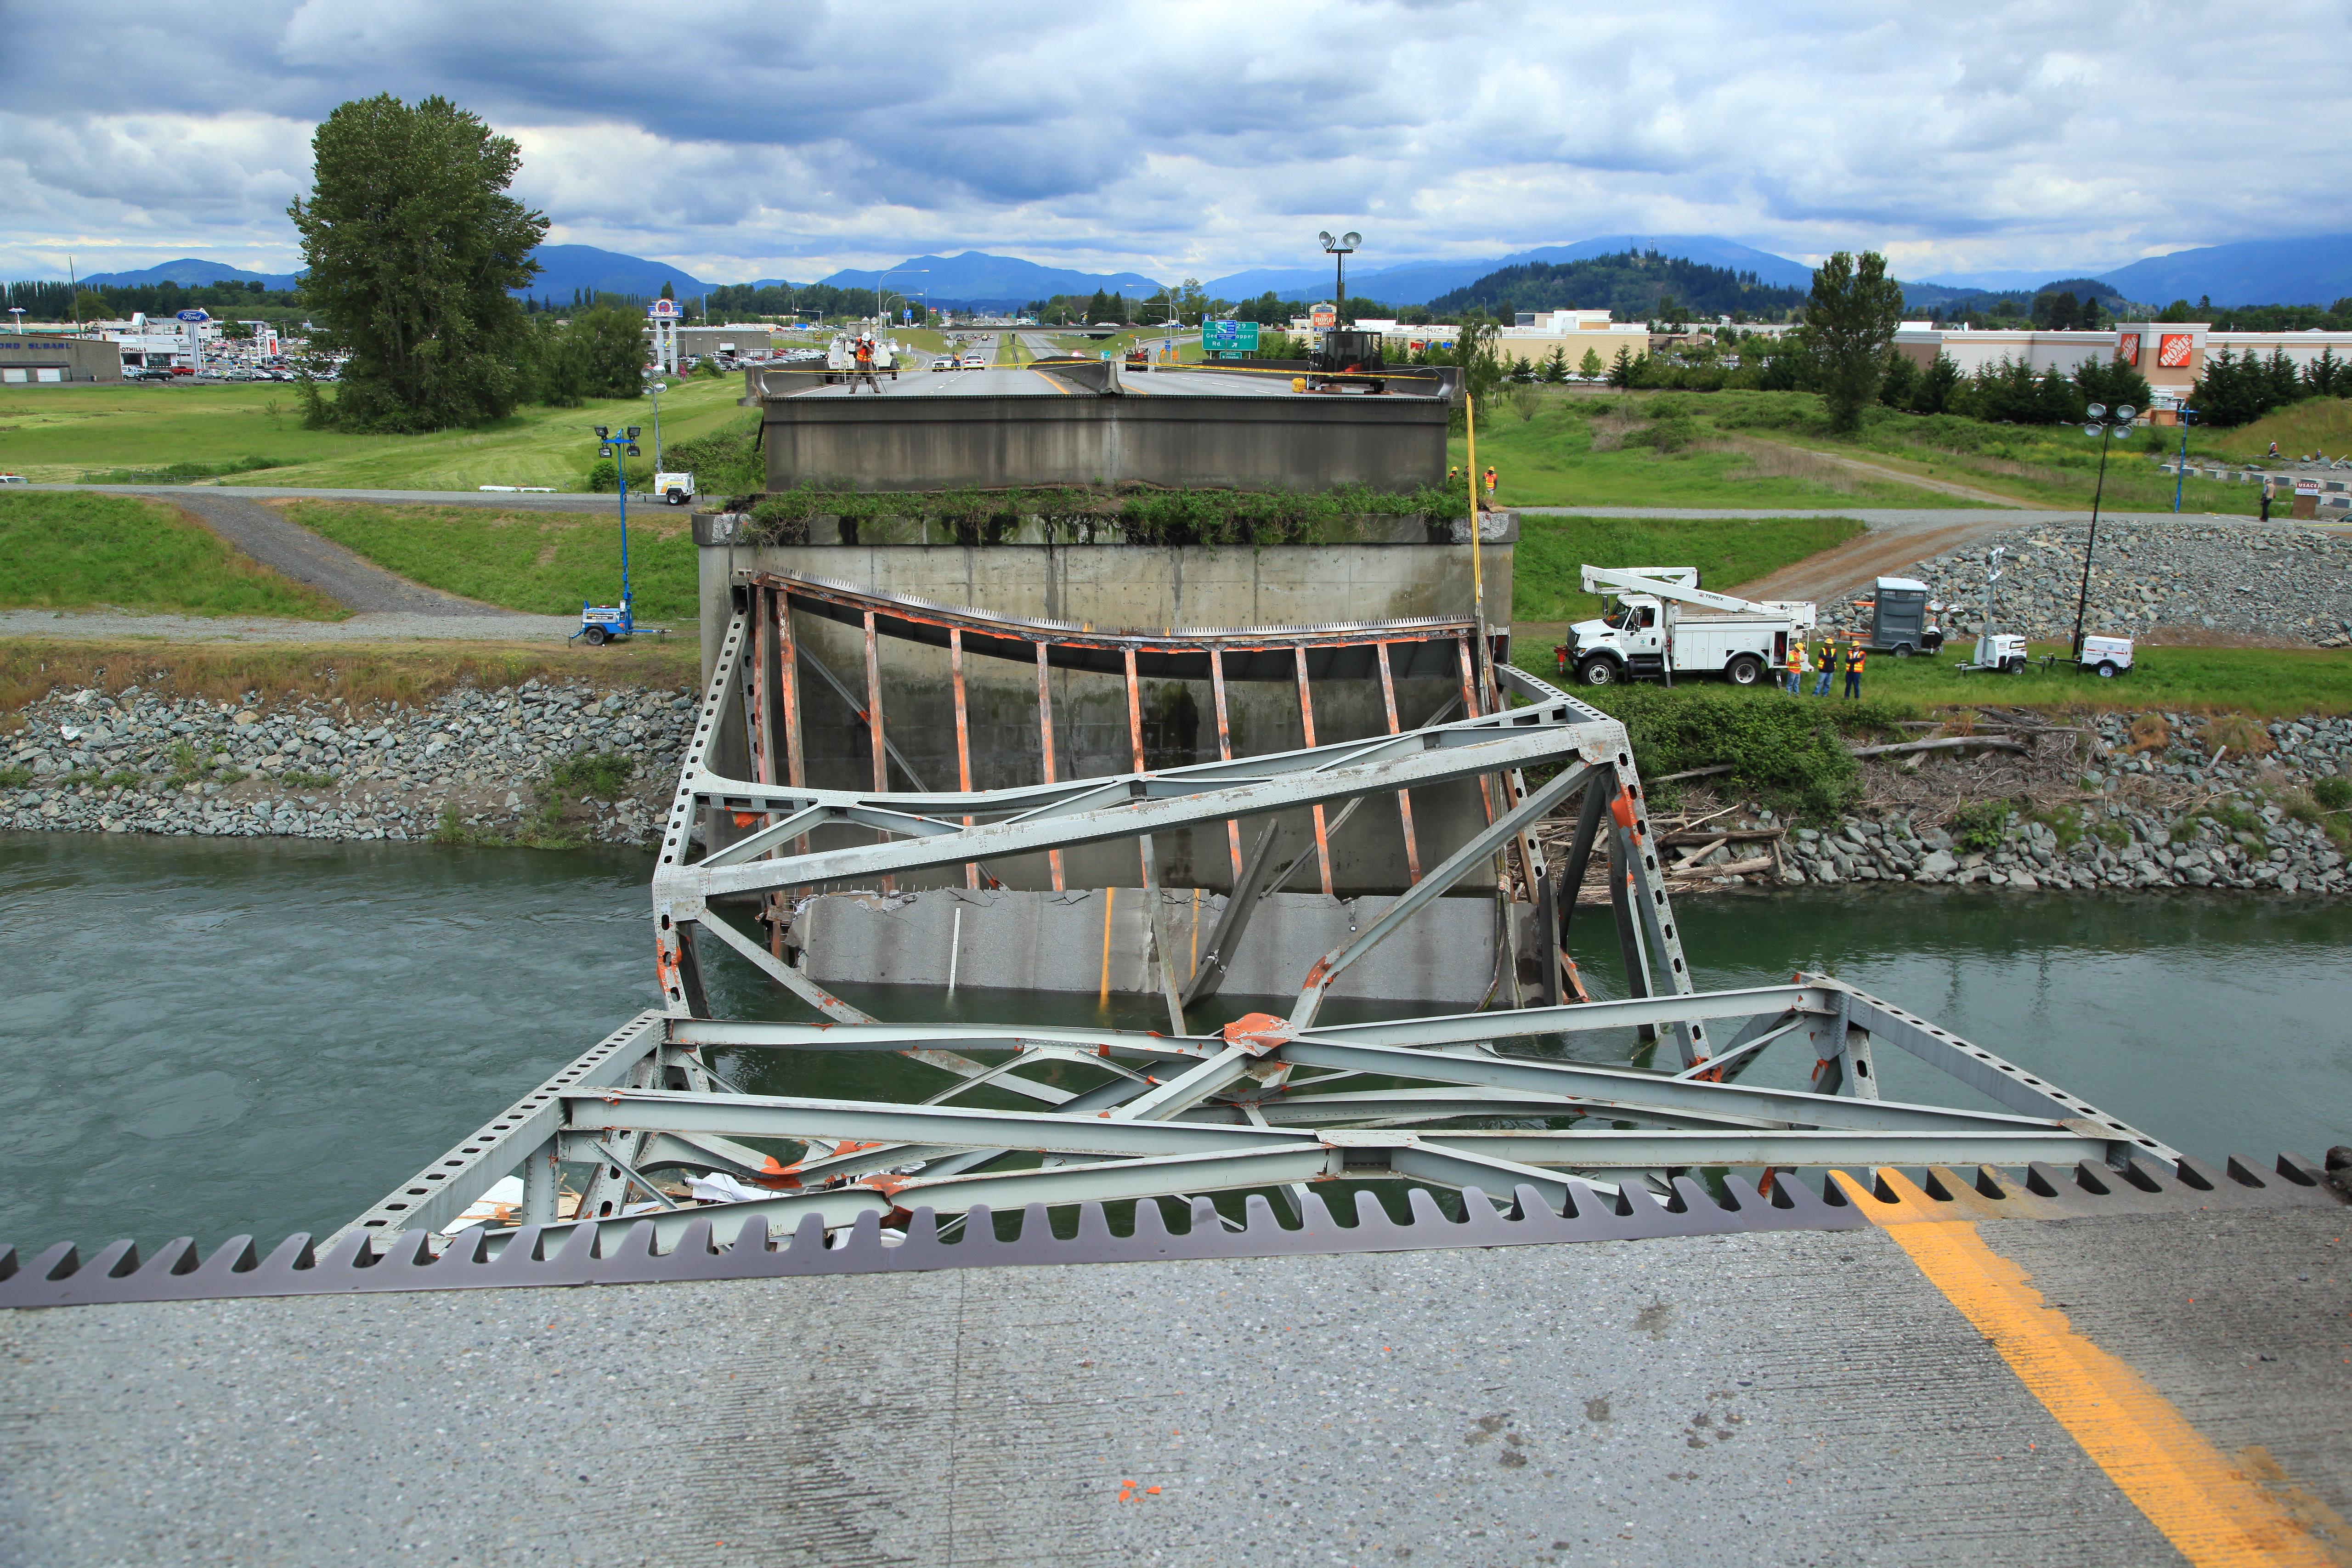 Photos of the I-5 Skagit River Bridge